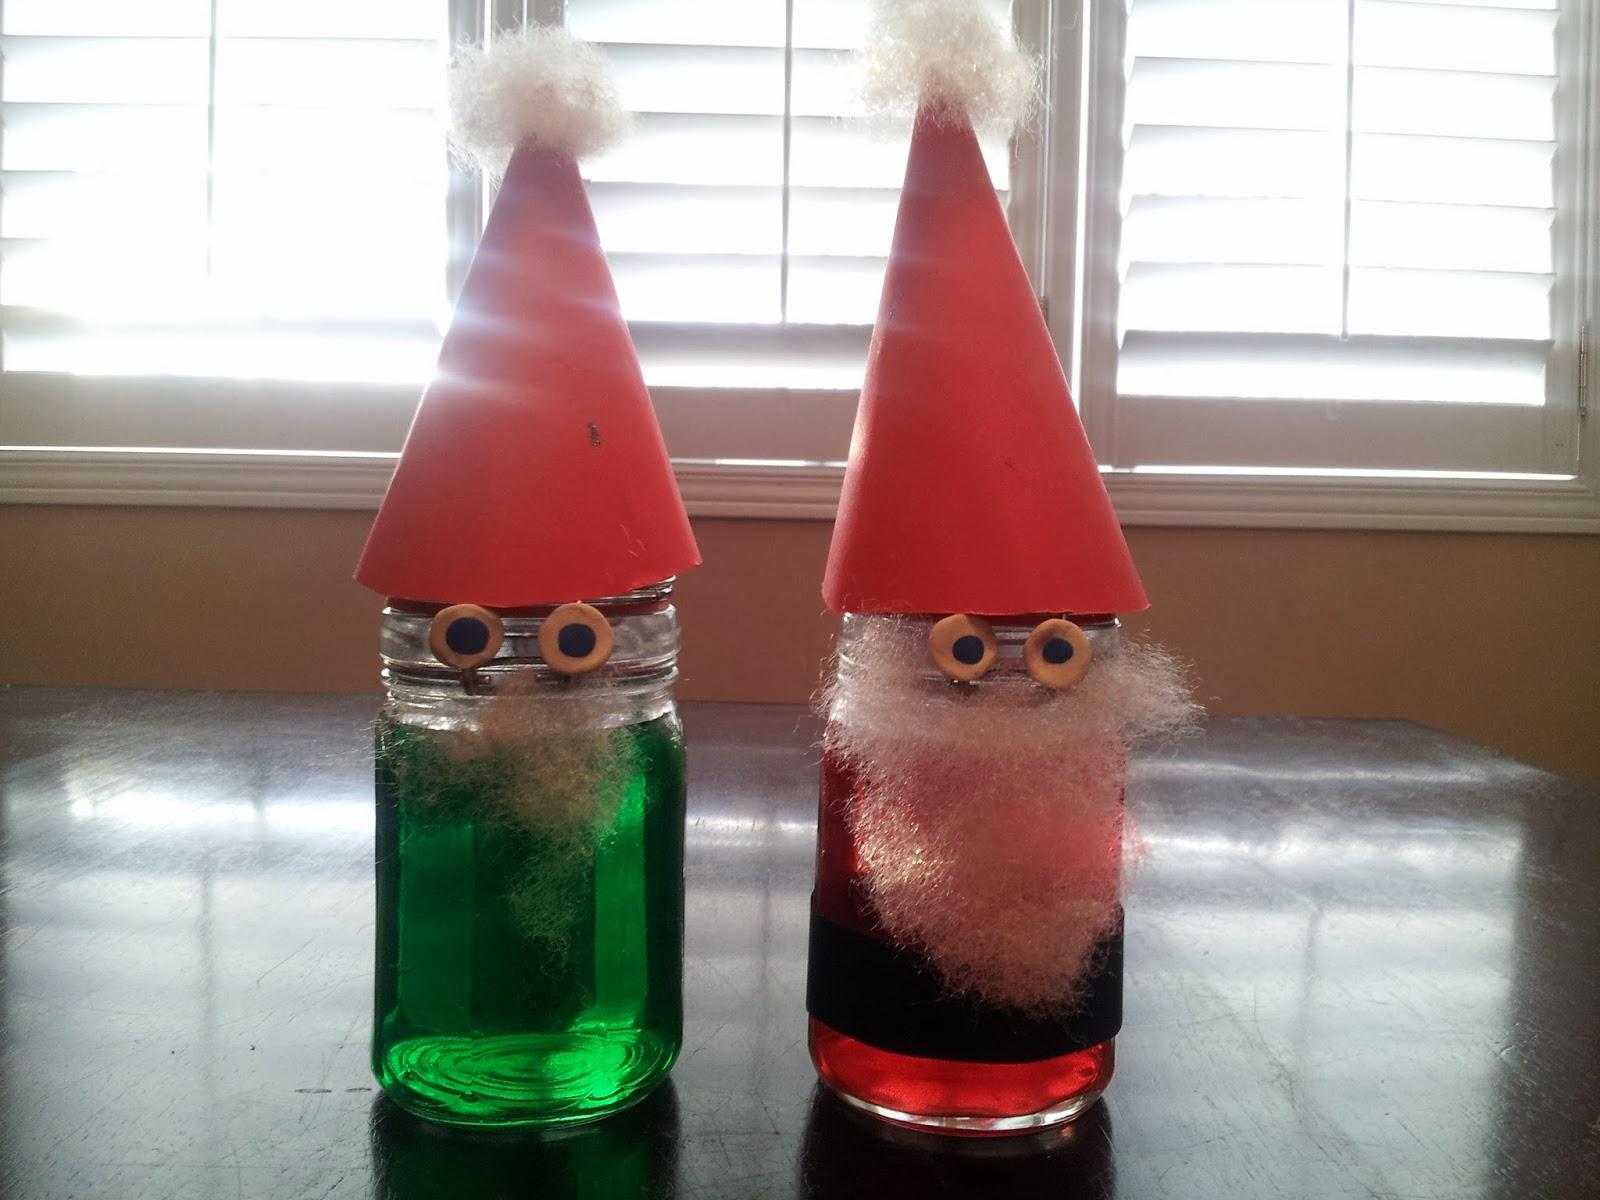 Glass Jar Santa and Elf, crafts, kids crafts